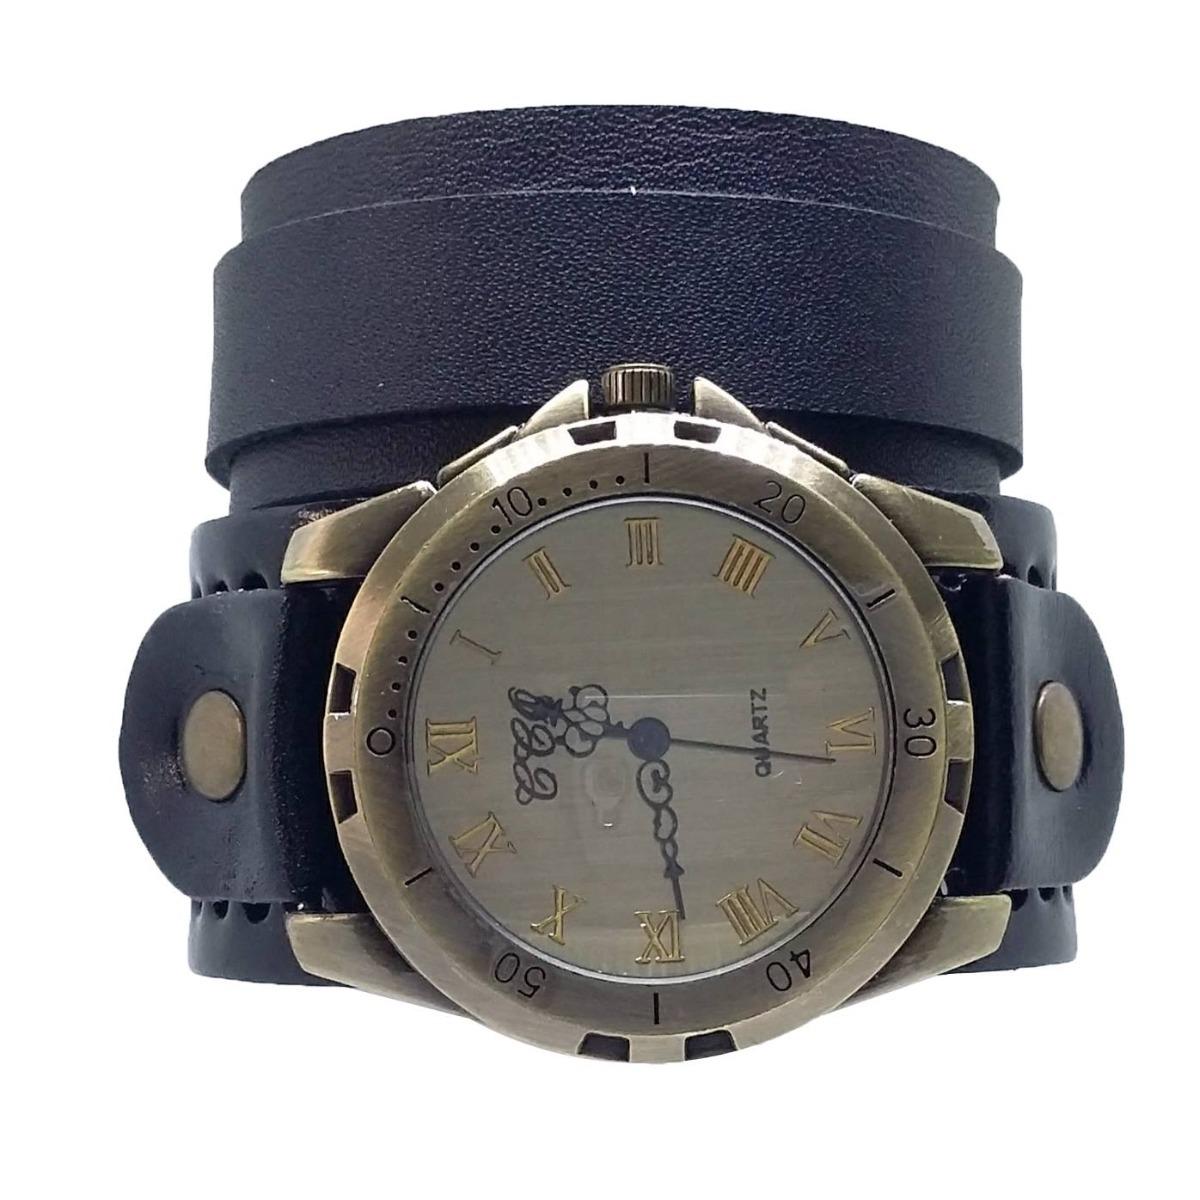 9bbaae56938 kit pulseira e relógio vintage masculino de couro preto. Carregando zoom.